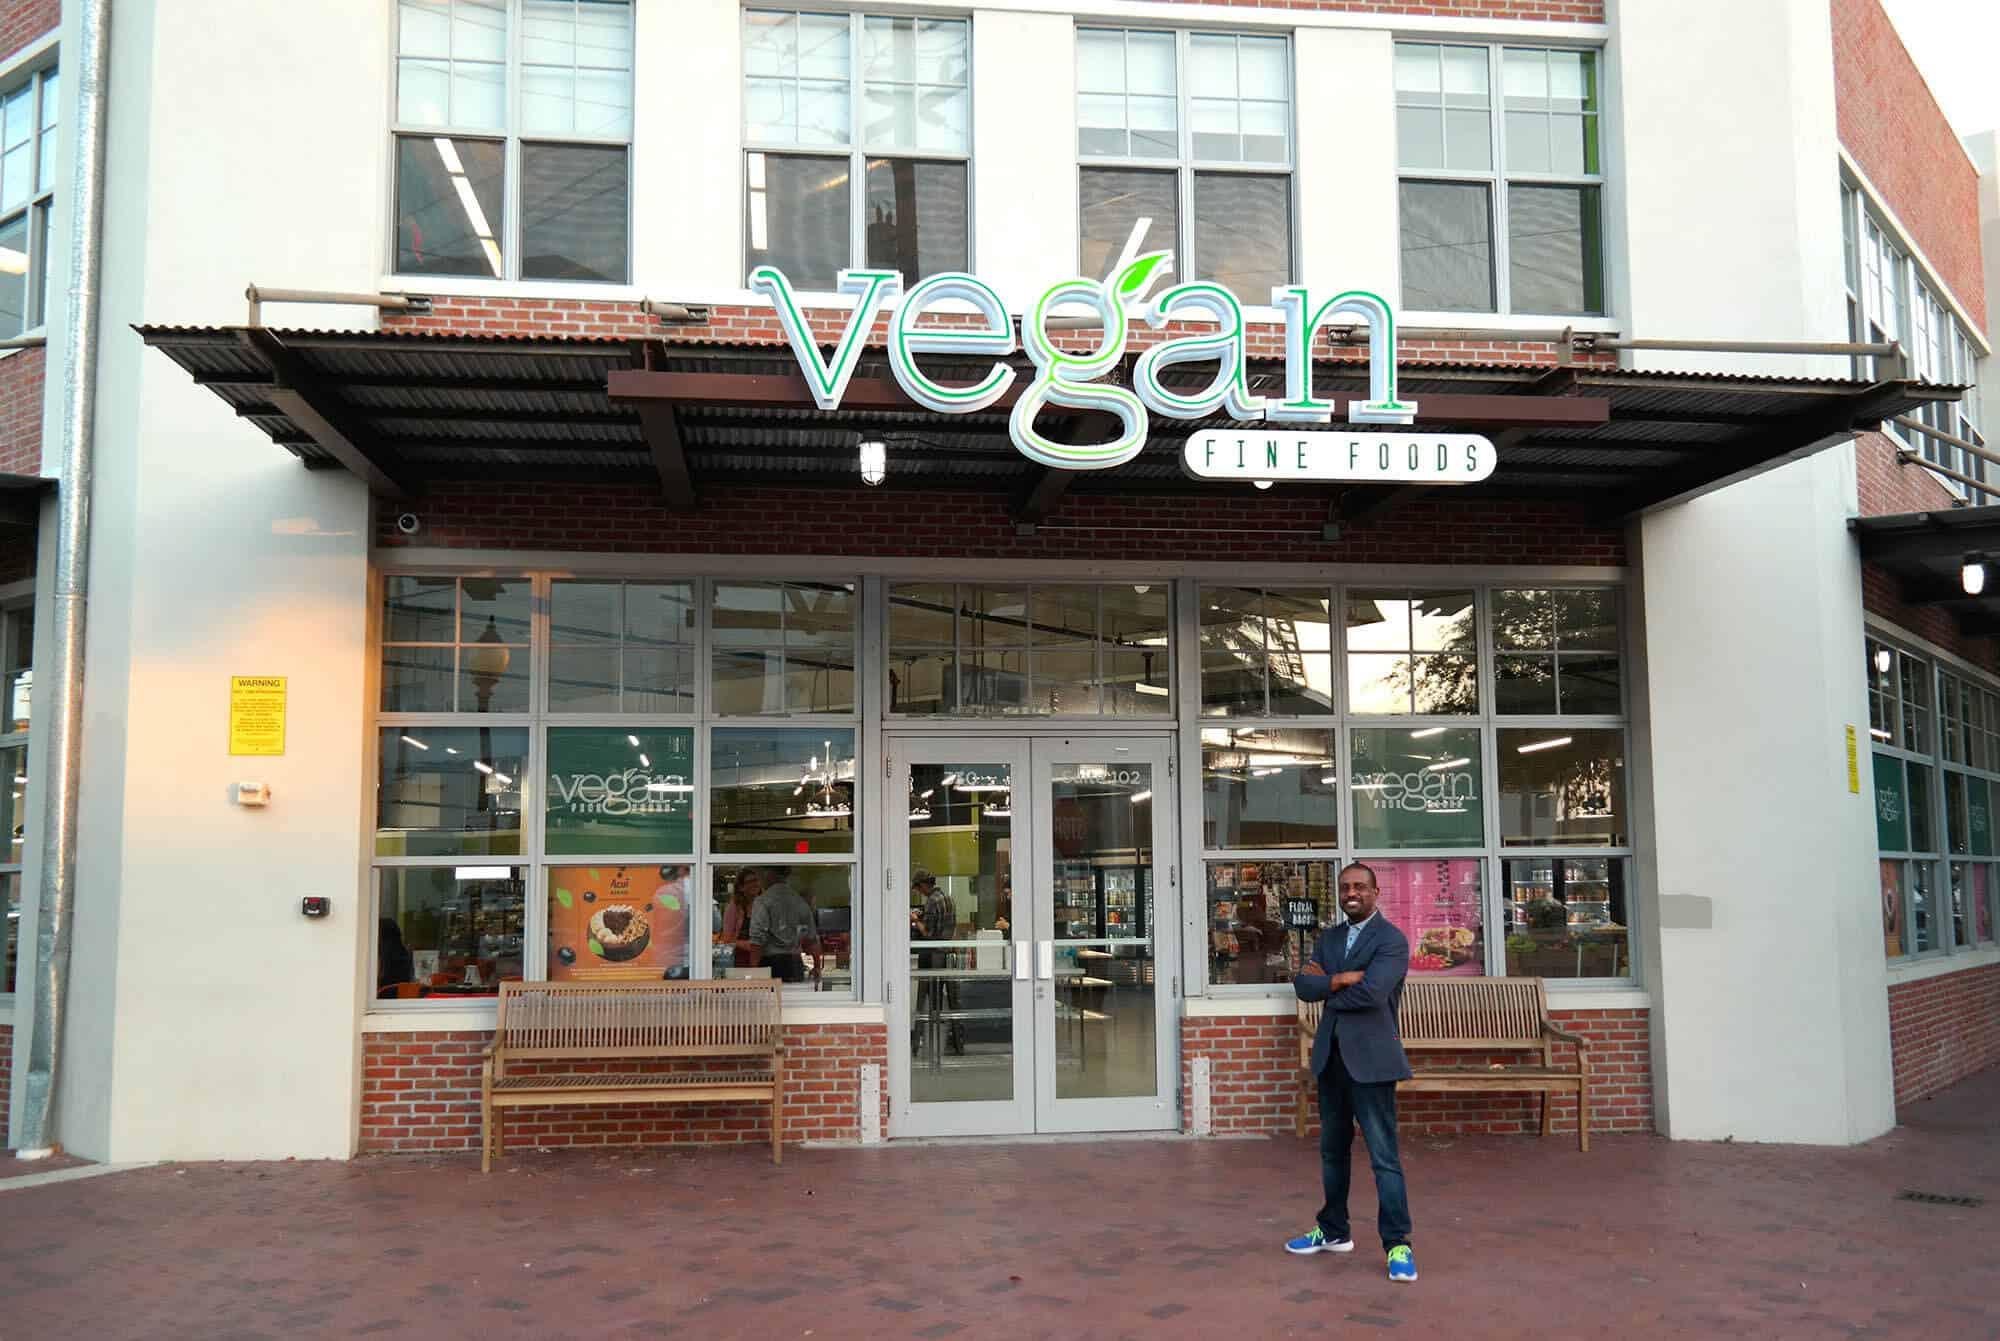 Vegan Fine Foods